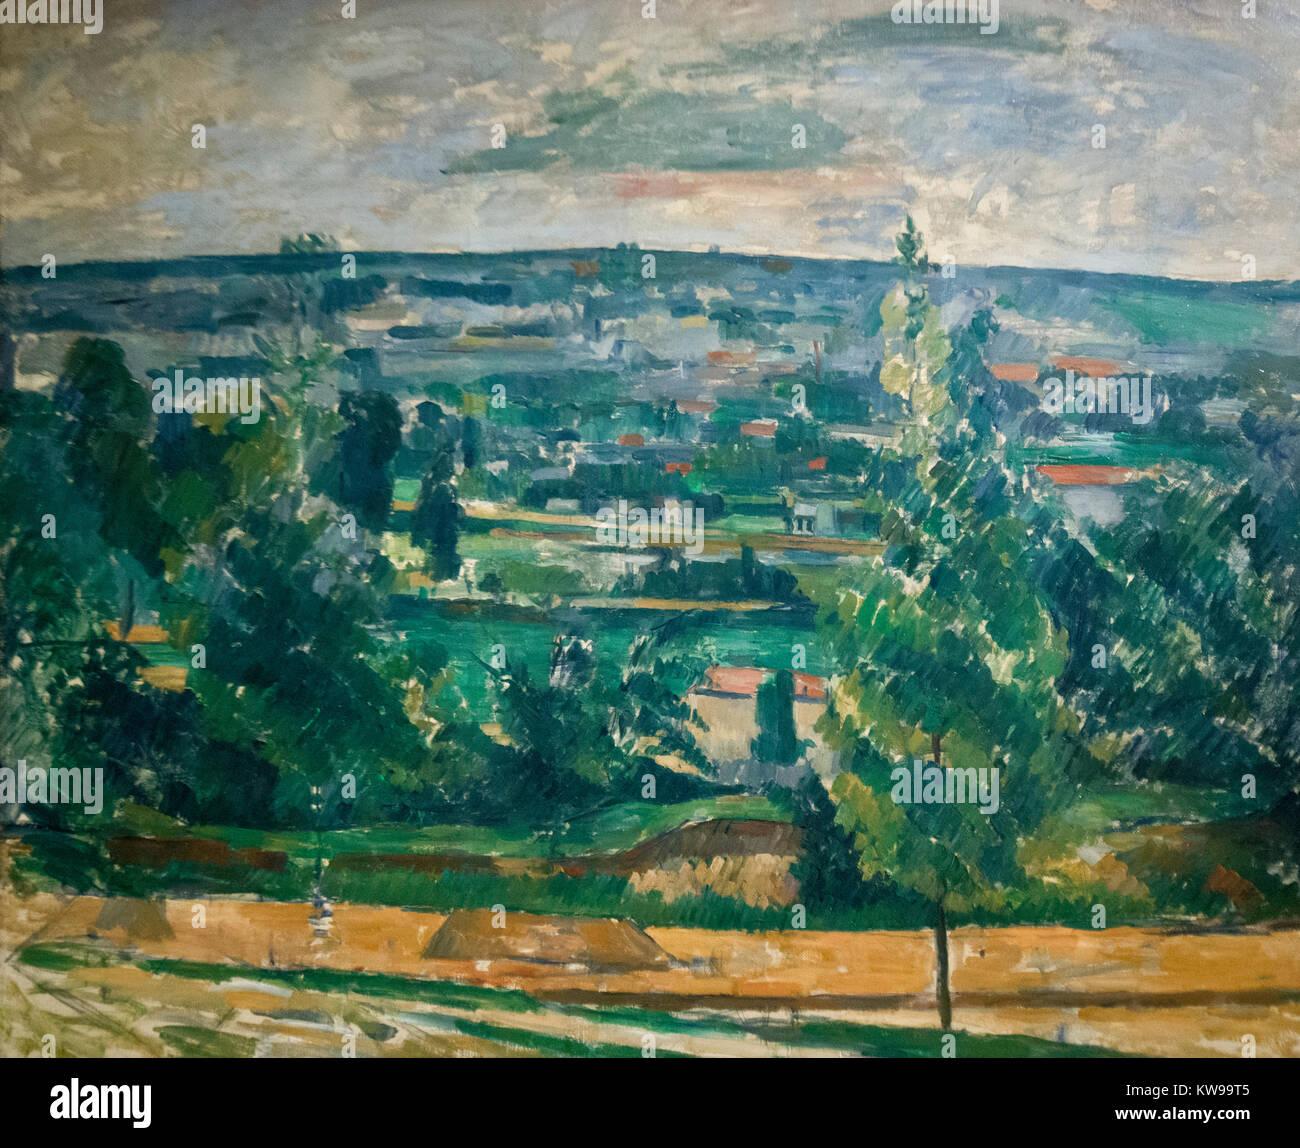 Paul Cezanne: 'Landscape near Melun' (1879) - Stock Image